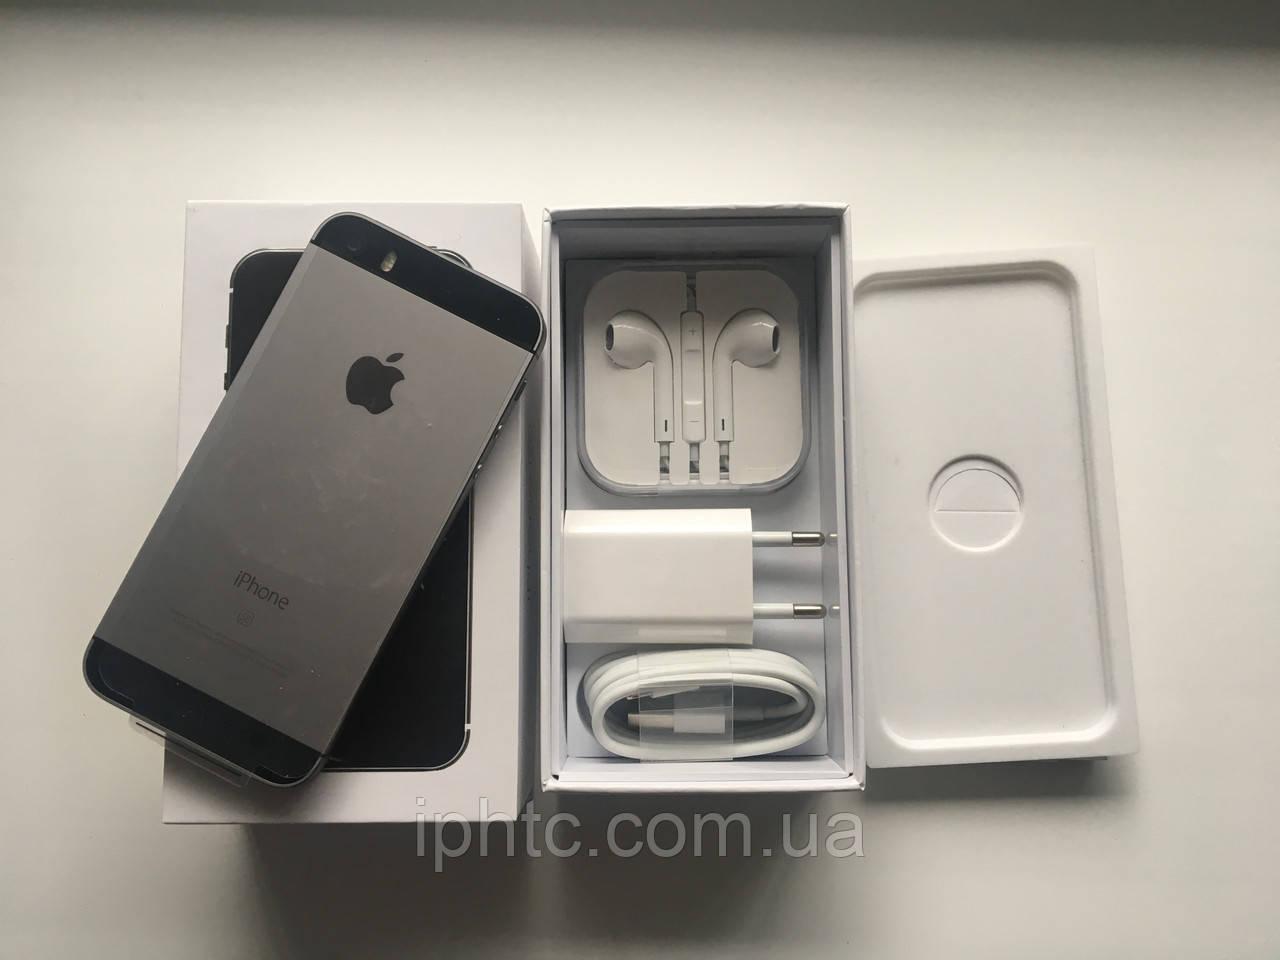 Apple iPhone SE 32GB Grey 4G /Новый / NeverLock, фото 1